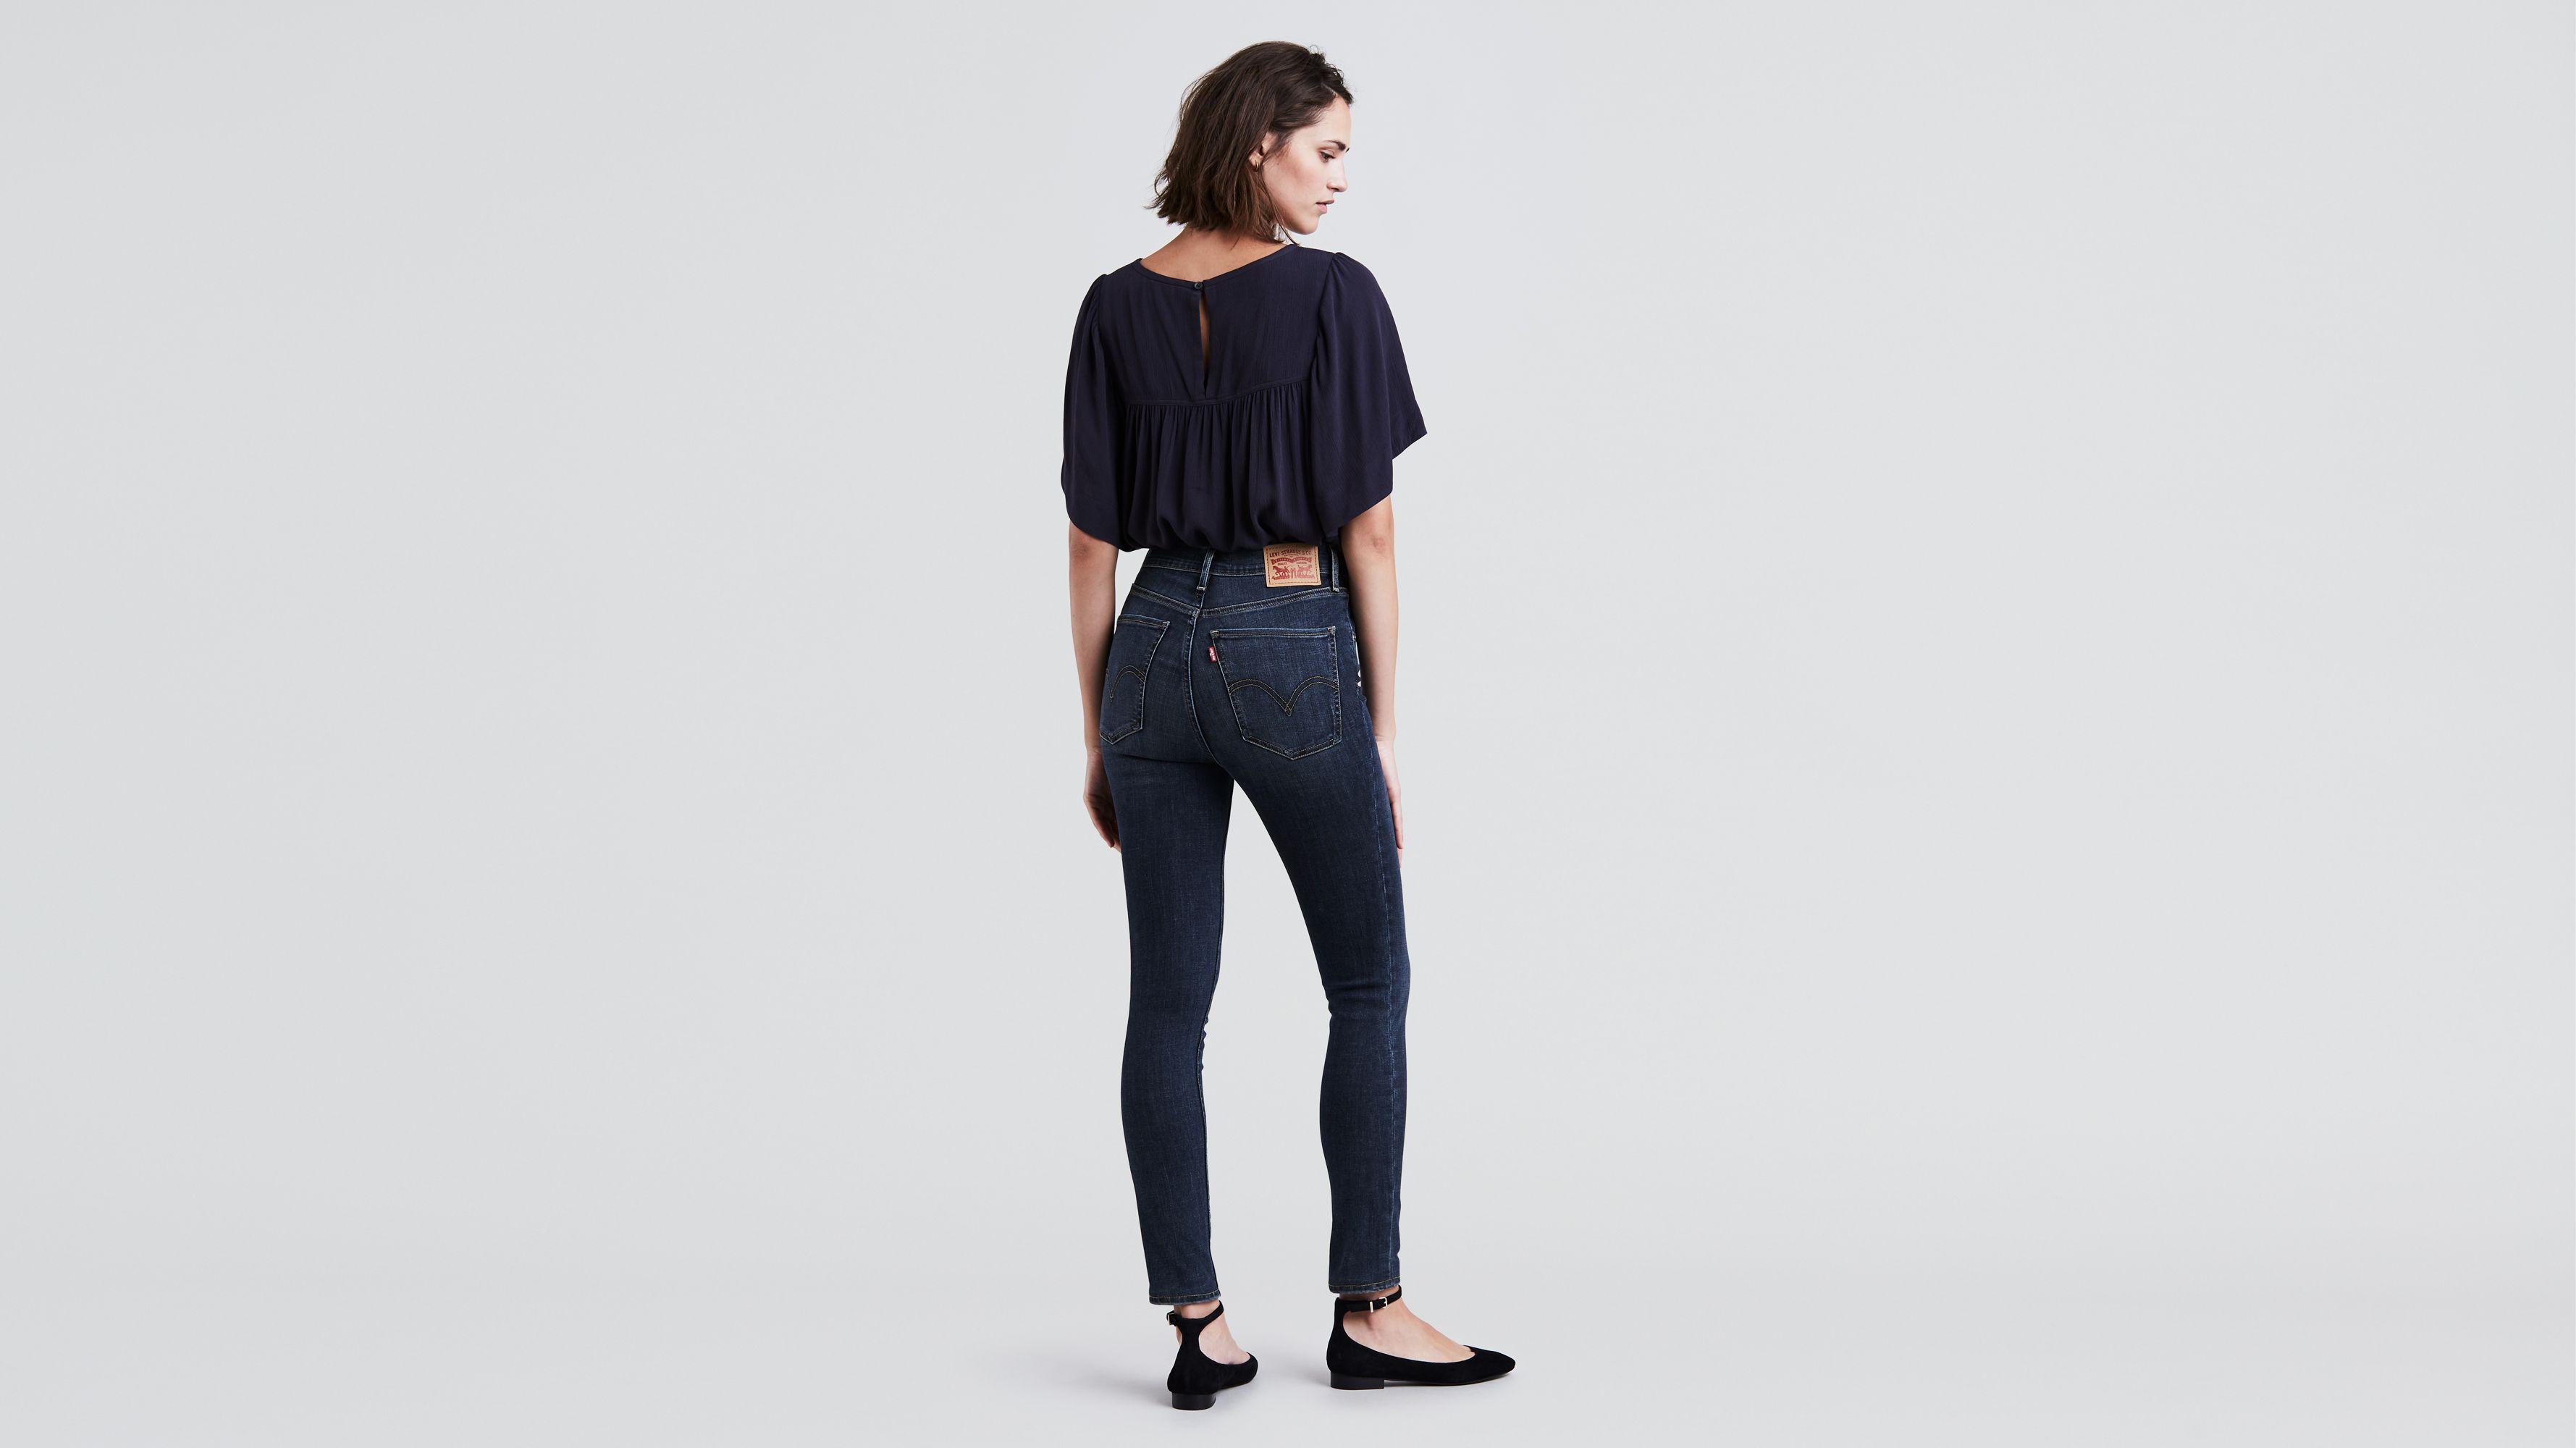 65b104bef1b8a8 Mile High Super Skinny Jeans - Dark Wash | Levi's® US